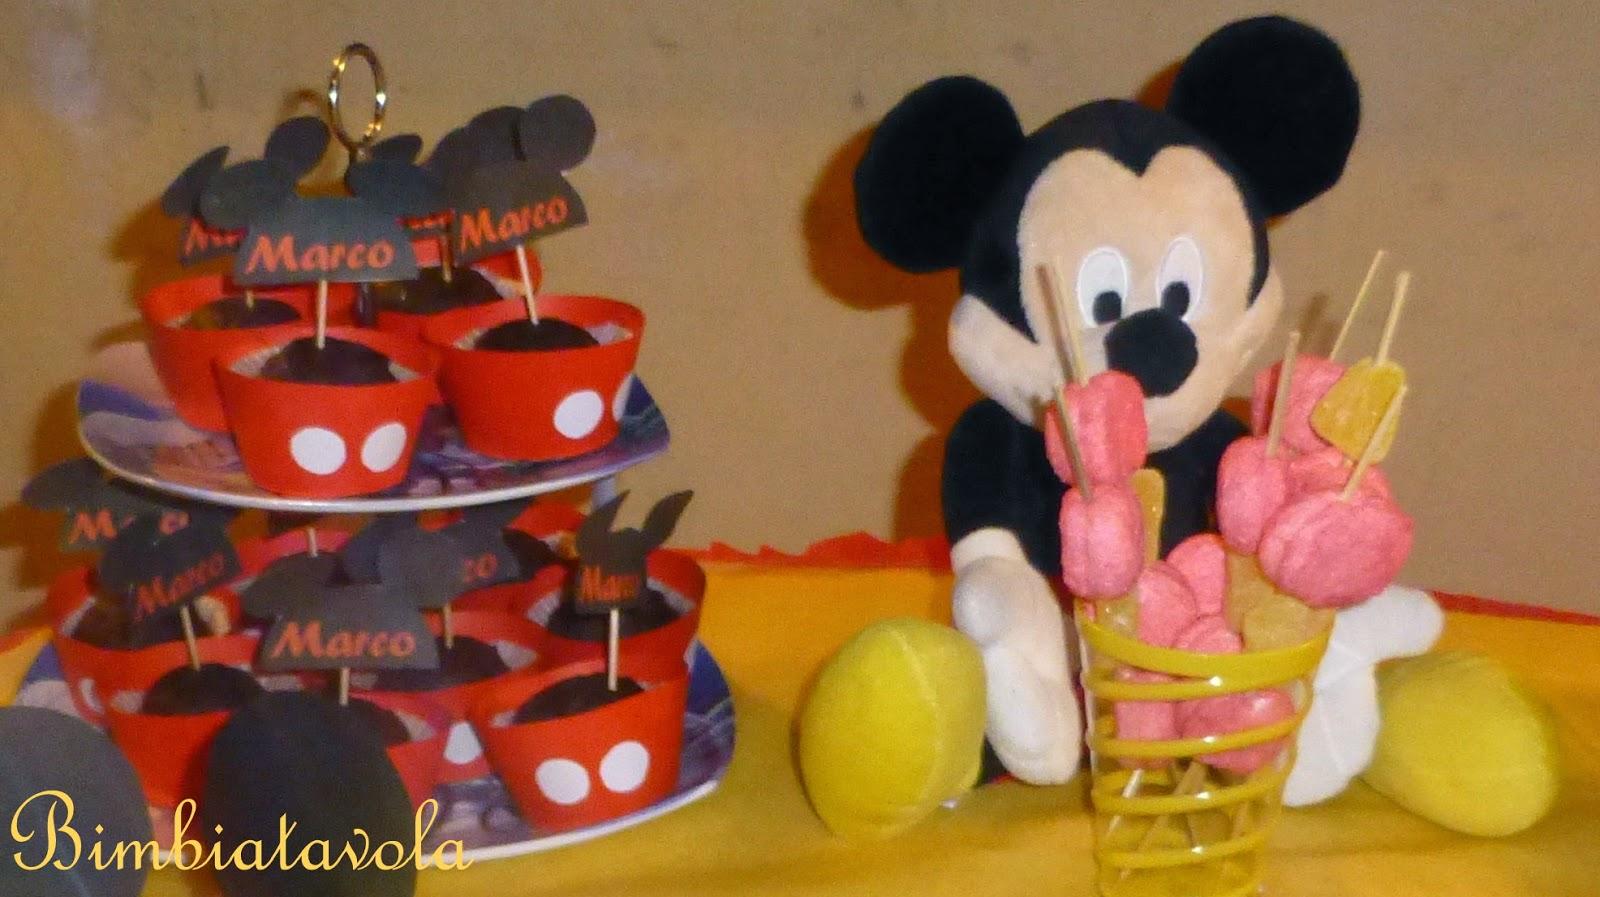 spesso bimbi a tavola: festa a tema topolino - mickey mouse party FS15